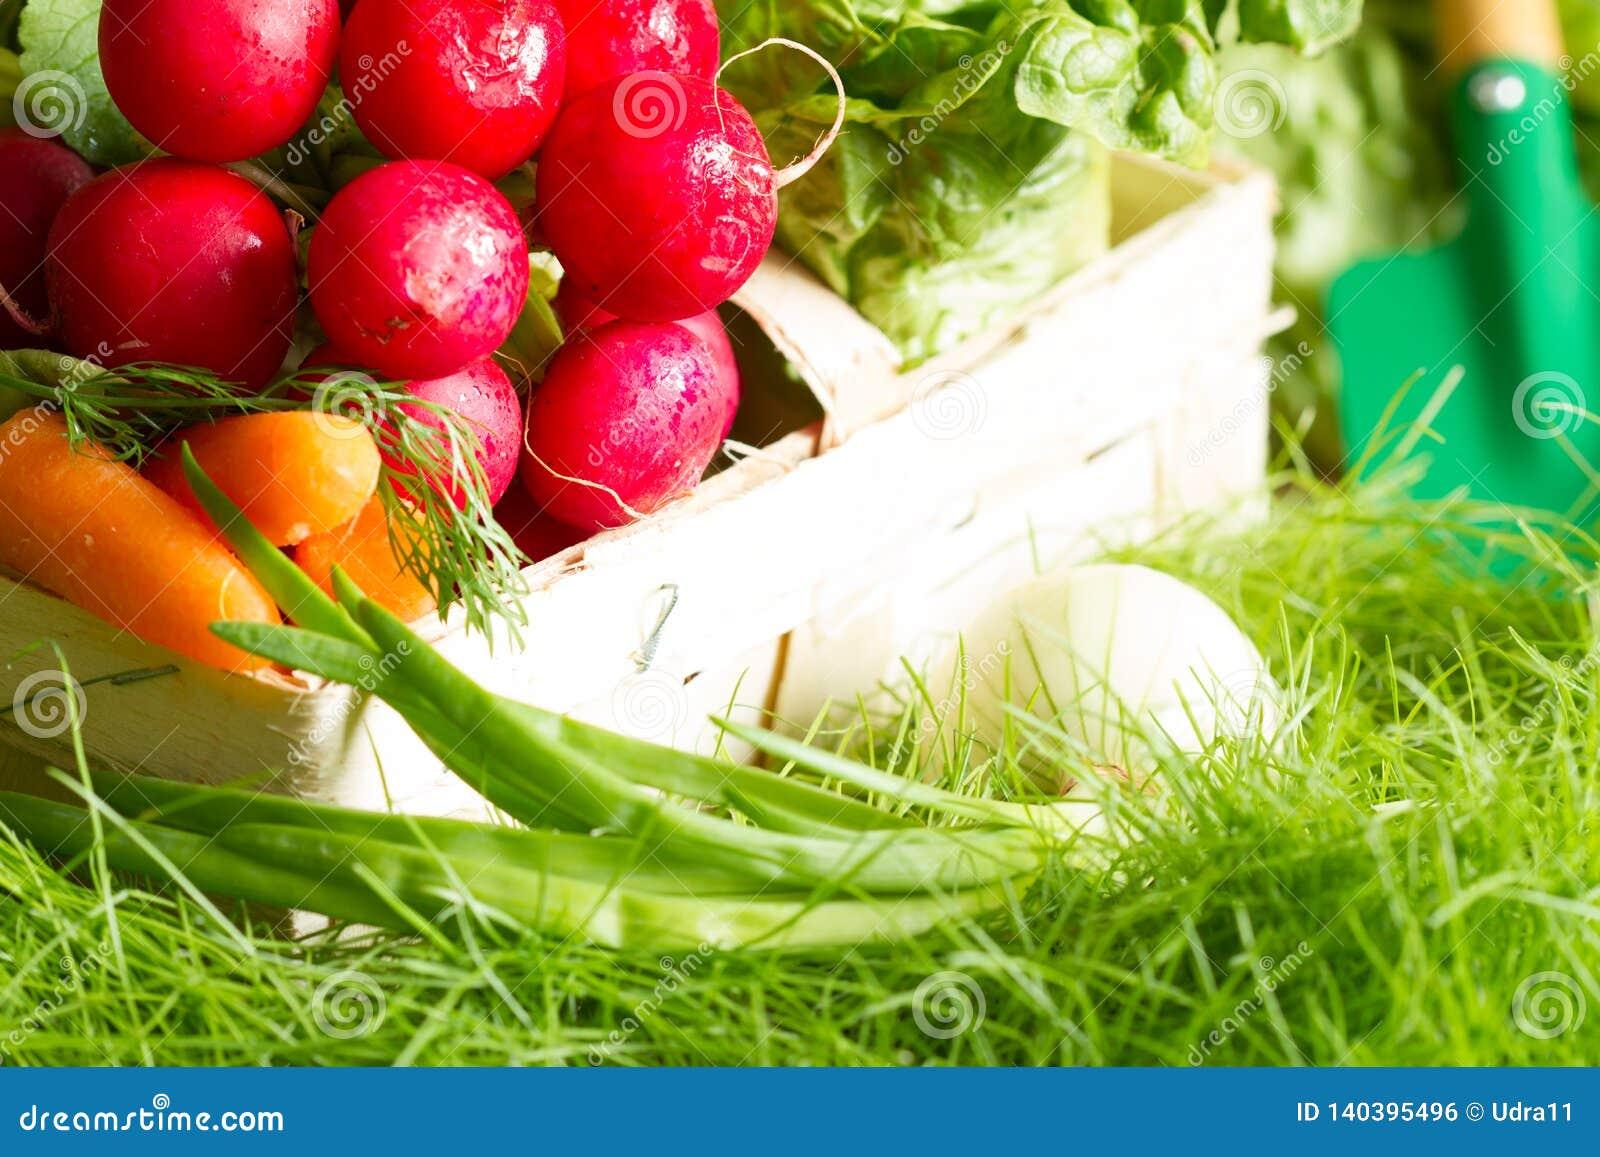 Spring raw fresh organic vegetables harvesting in the garden